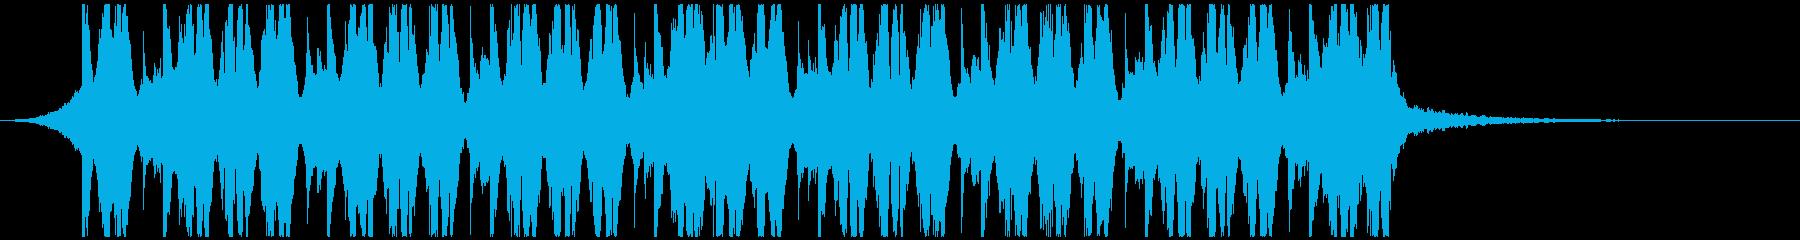 Future Pop 3の再生済みの波形